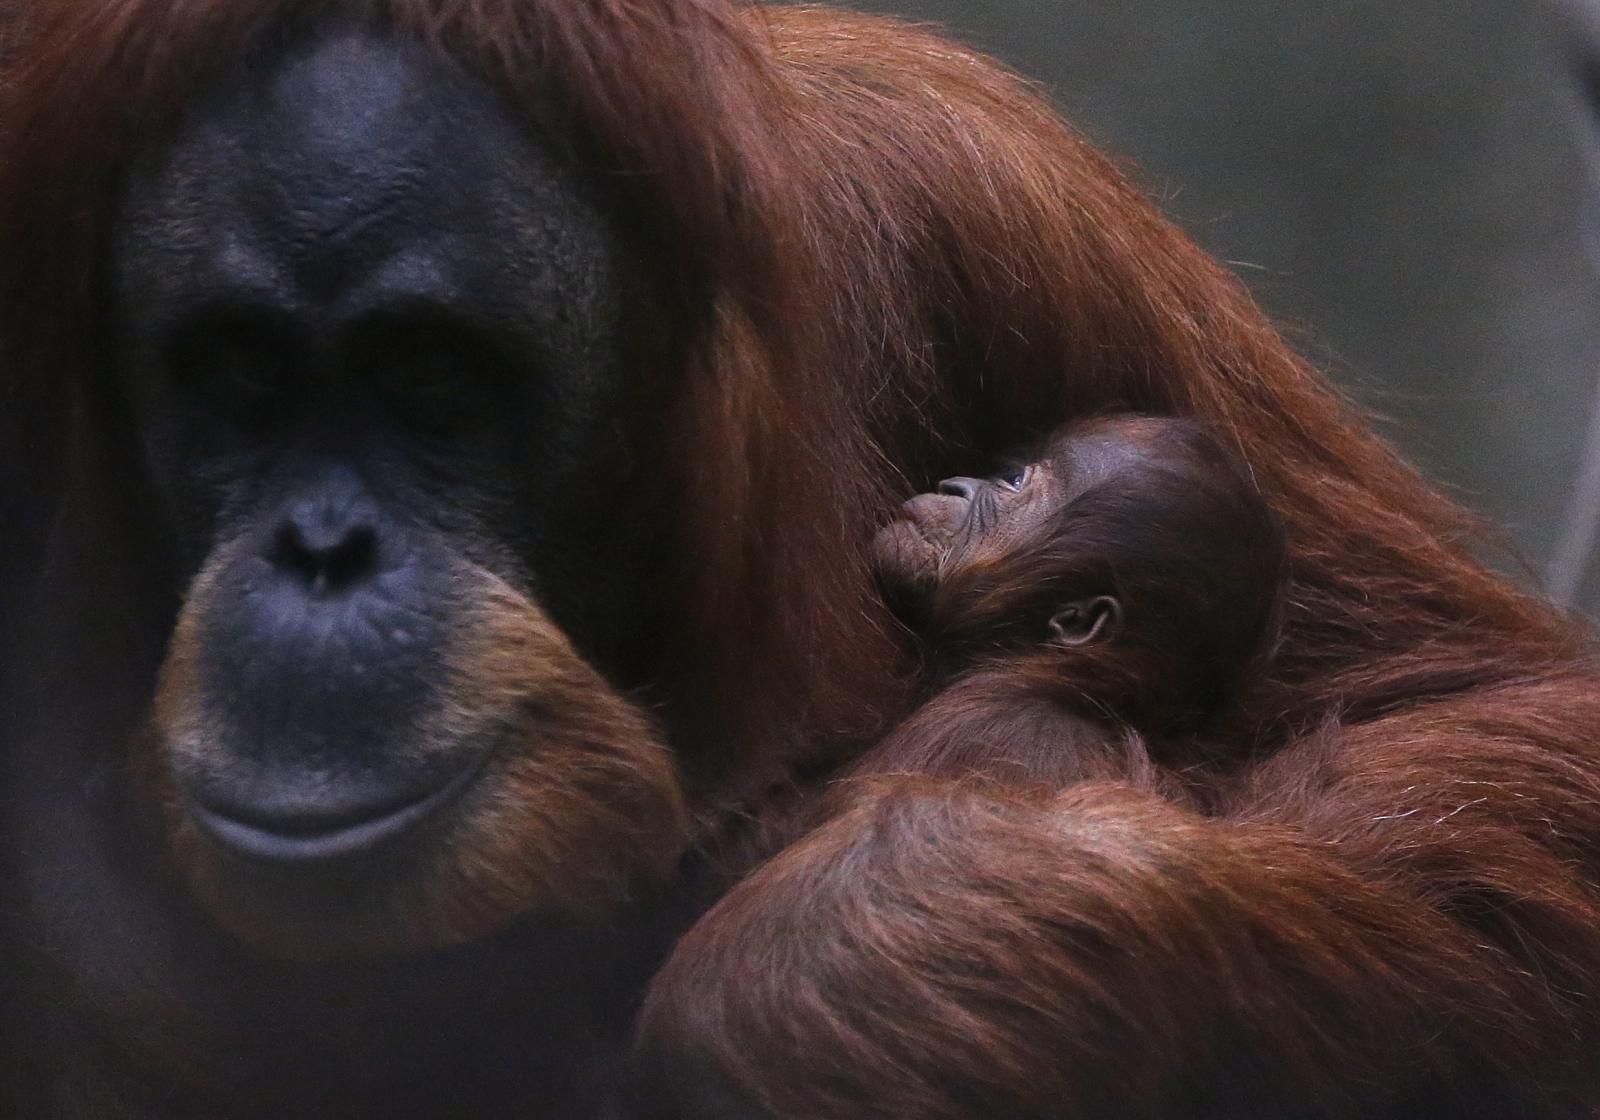 Half of world's primat...